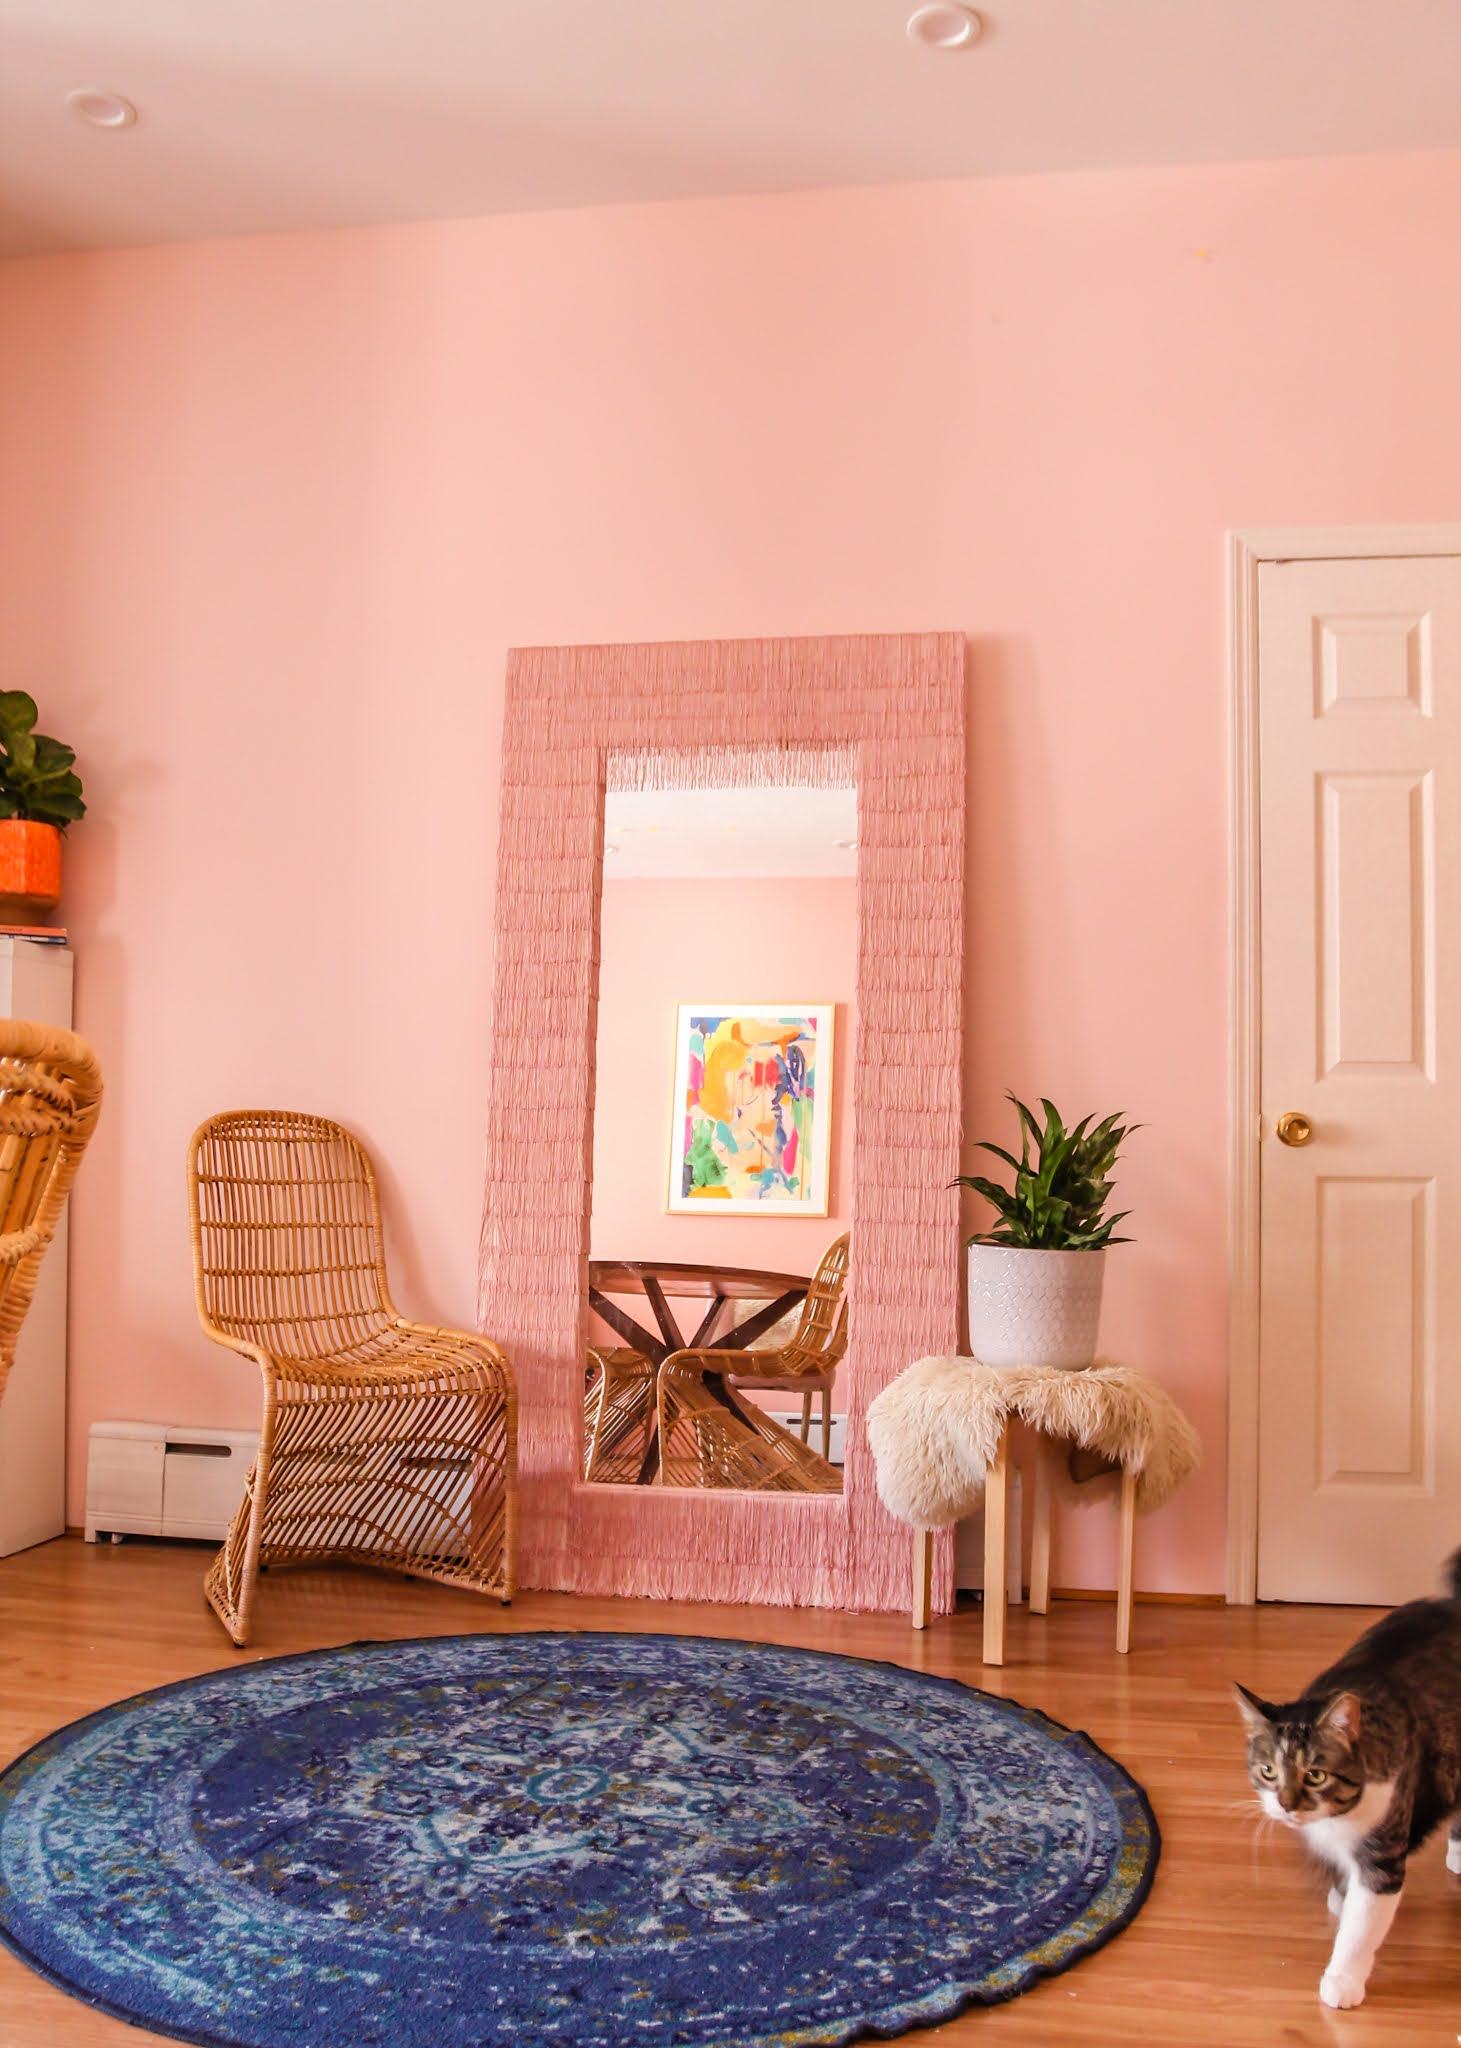 Ikea Hack // Ikea Mirror Hacks // Fringe Mirror // DIY fringe mirror // DIY floor length fringe mirror // floor length fringe mirror // pink fringe mirror // fringe diy // Megan Zietz // tfdiaries // easy ikea mirror epicycle // easy ikea mirror hack // easy ikea hacks // colorful homes // pink mirror // diy pink mirror // fringe mirror tutorial // budget friendly mirror diy // ikea mongstad mirror diy // ikea mongstad mirror hack // ikea mongstad // pink mirrors // pink floor length mirror